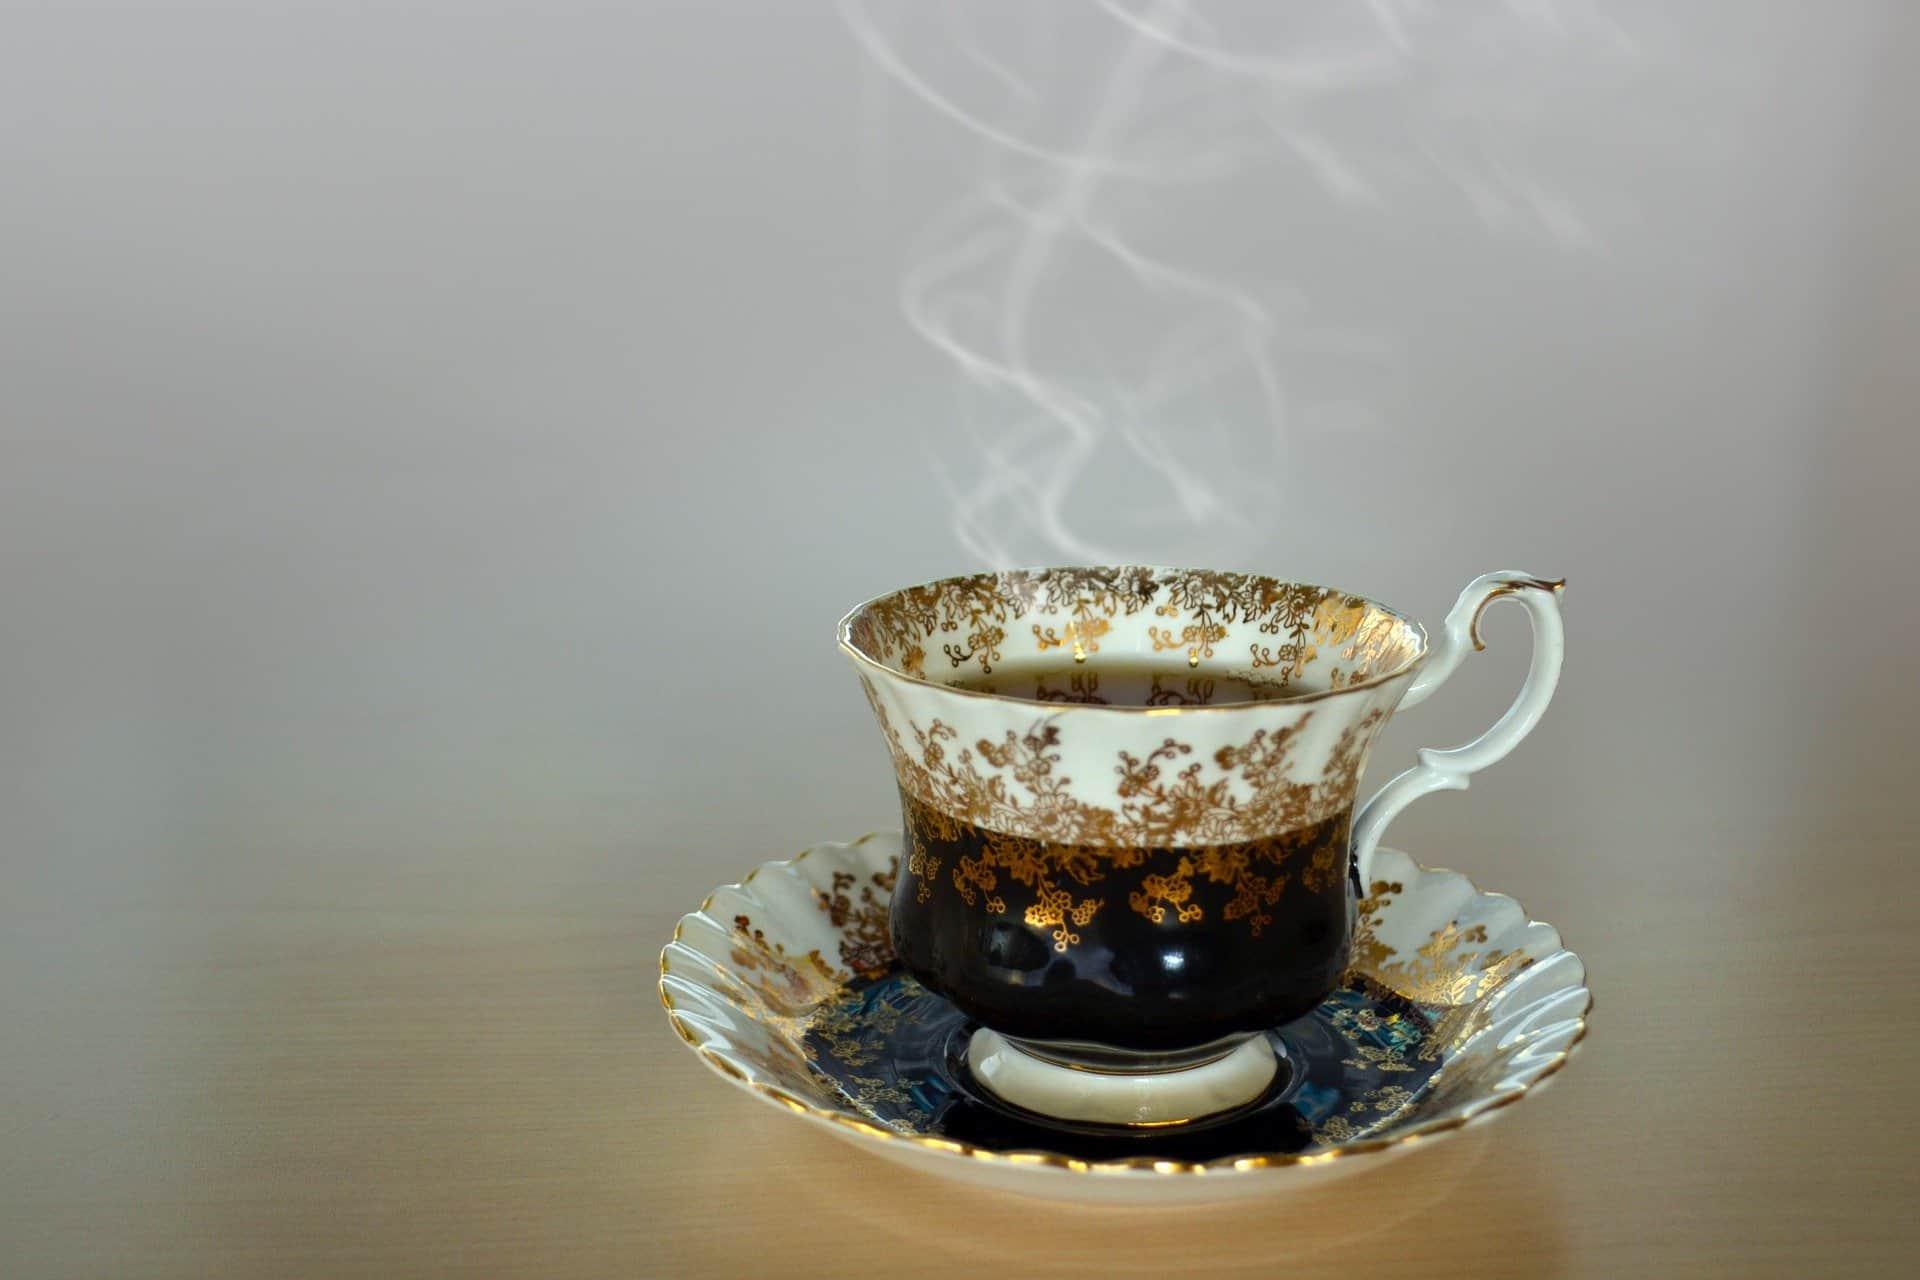 tea-1170551_1920 (1)